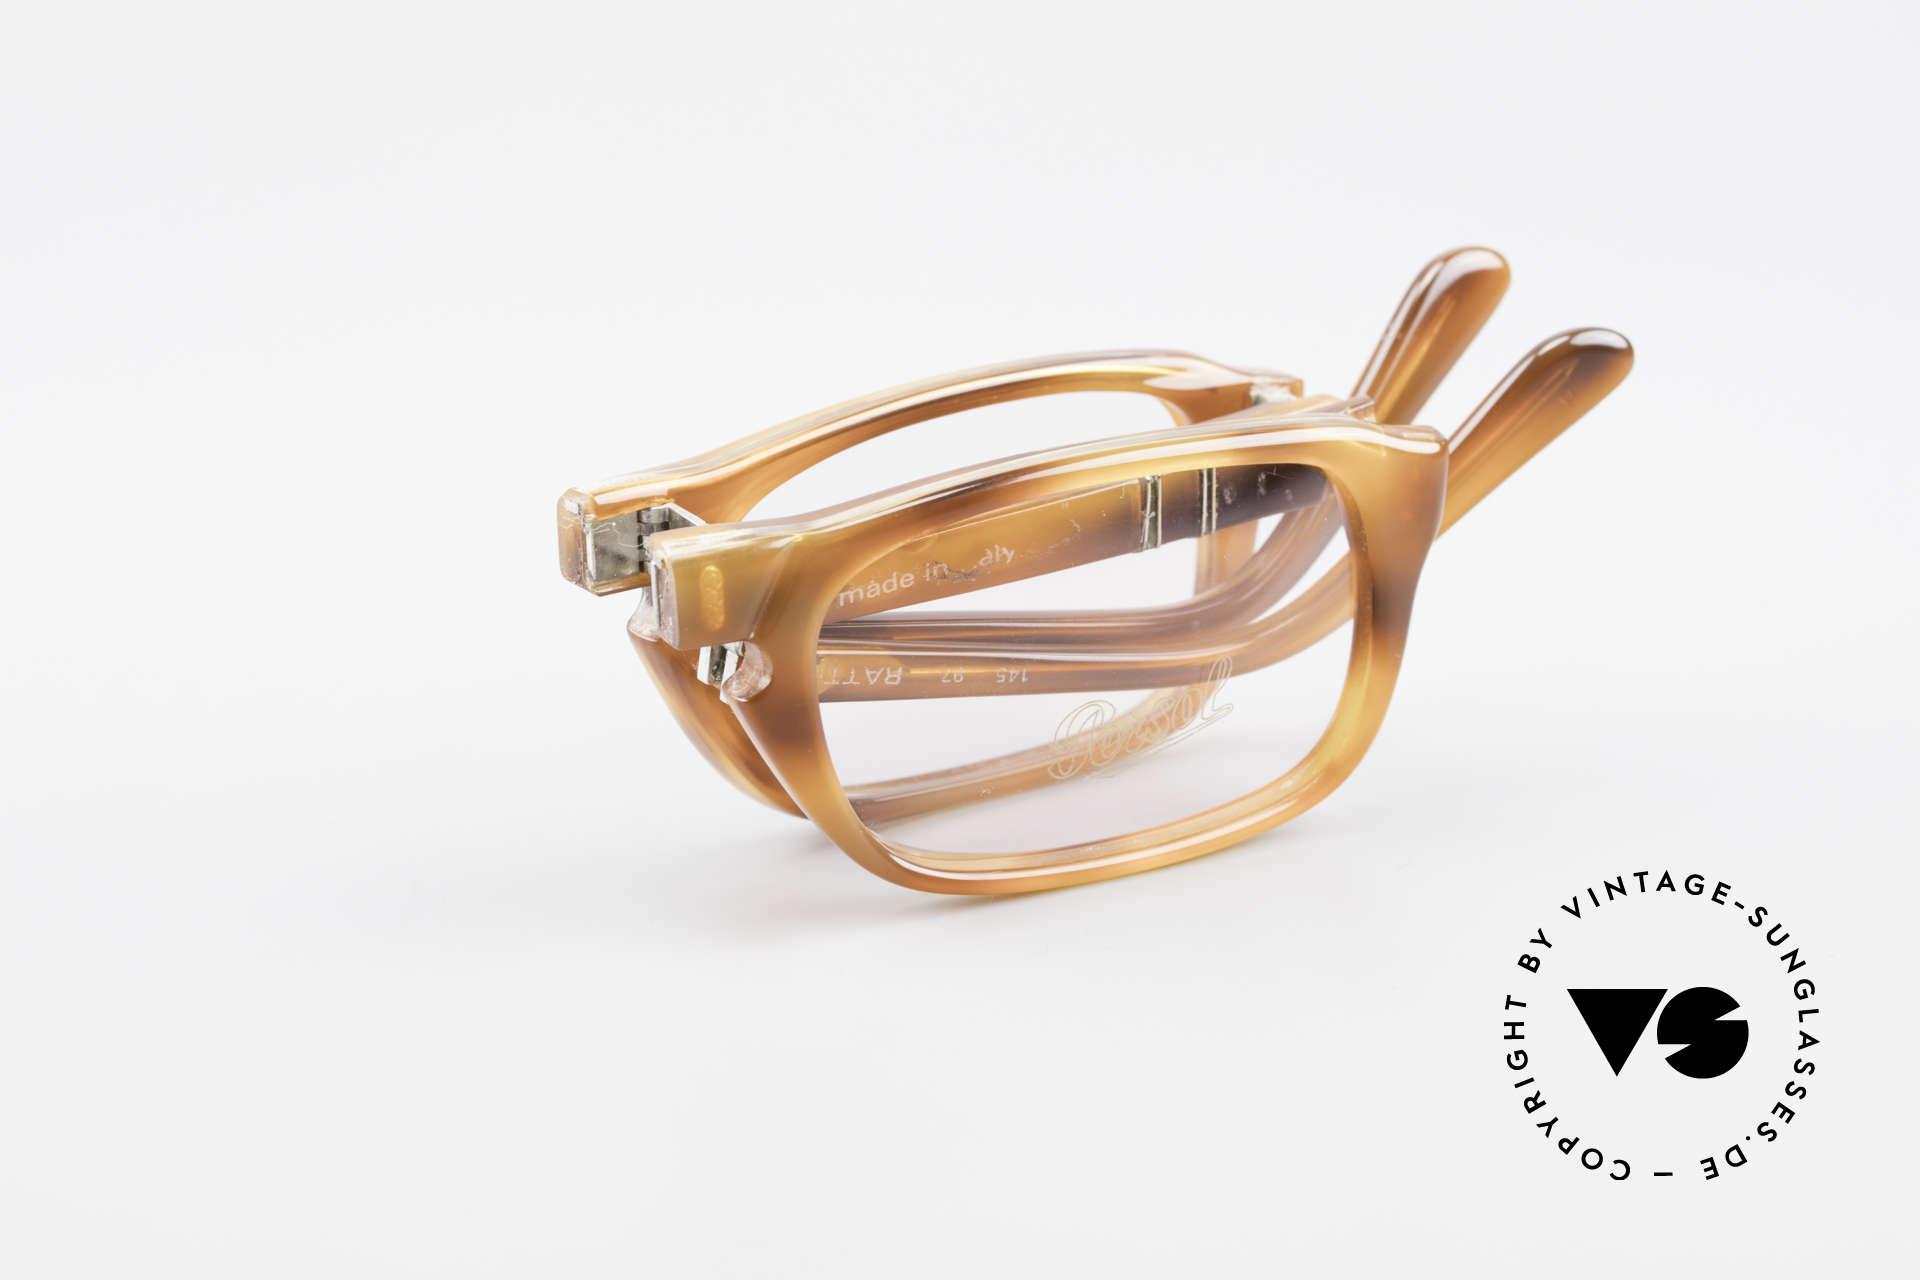 Persol Ratti 813 Folding Folding Reading Eyeglasses, Size: medium, Made for Men